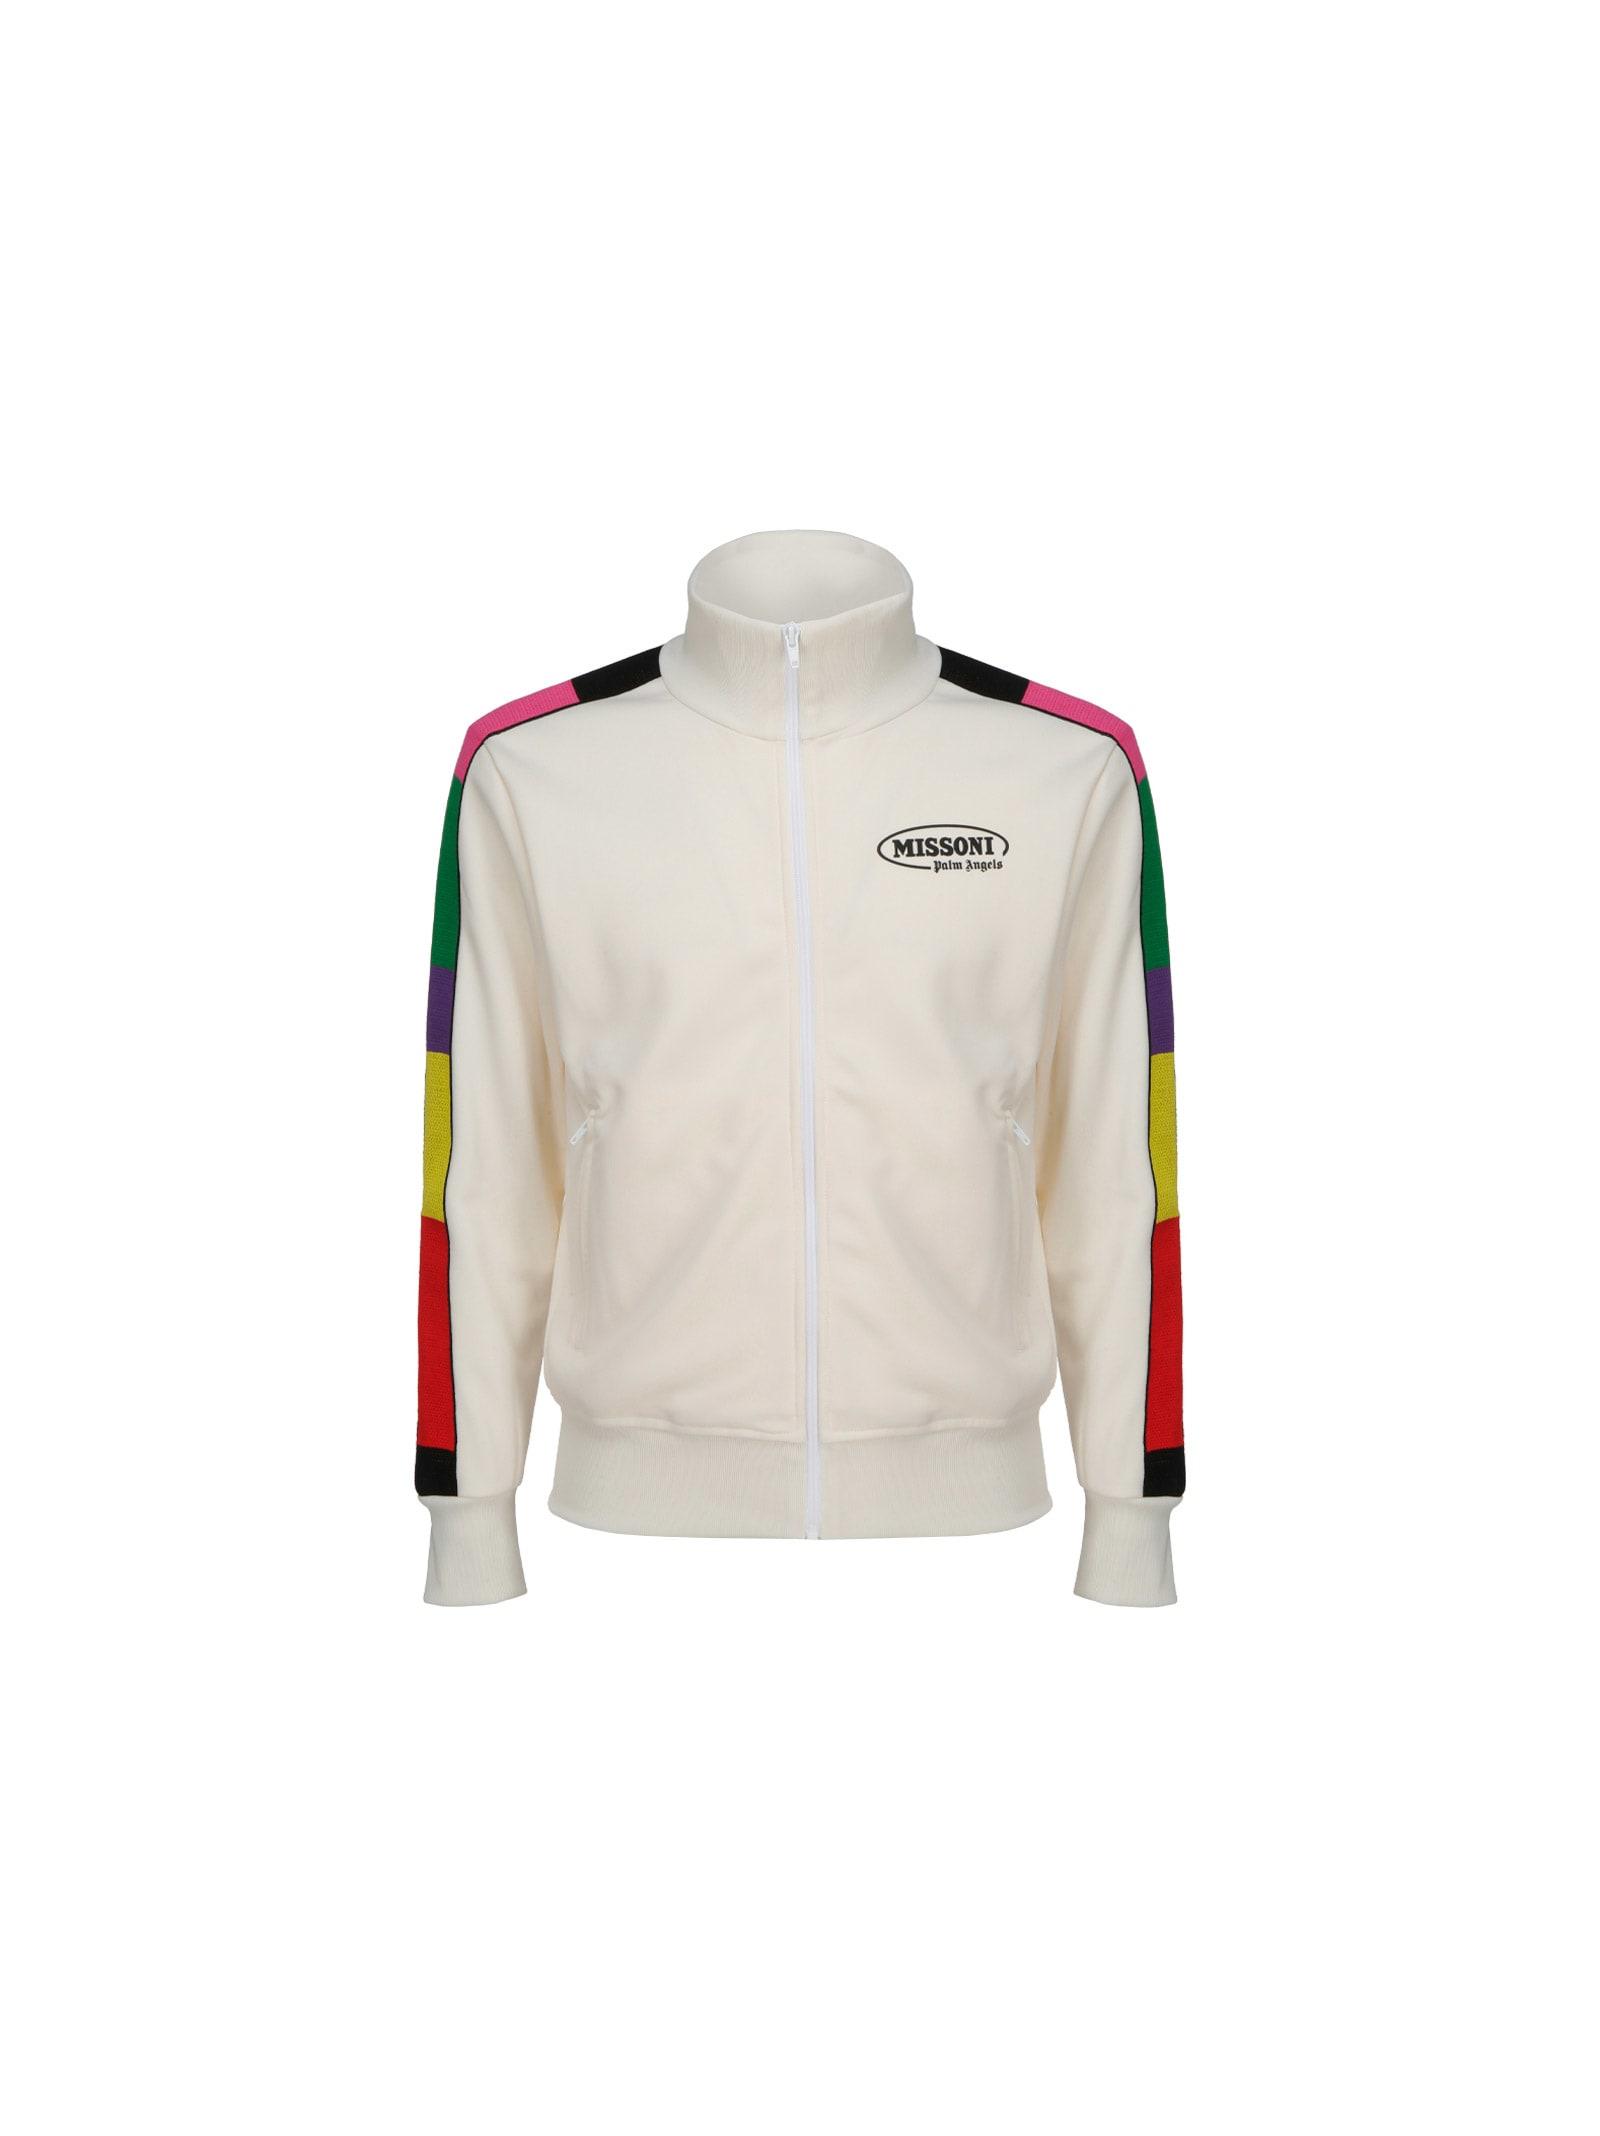 Palm Angels X Missoni Track Jacket